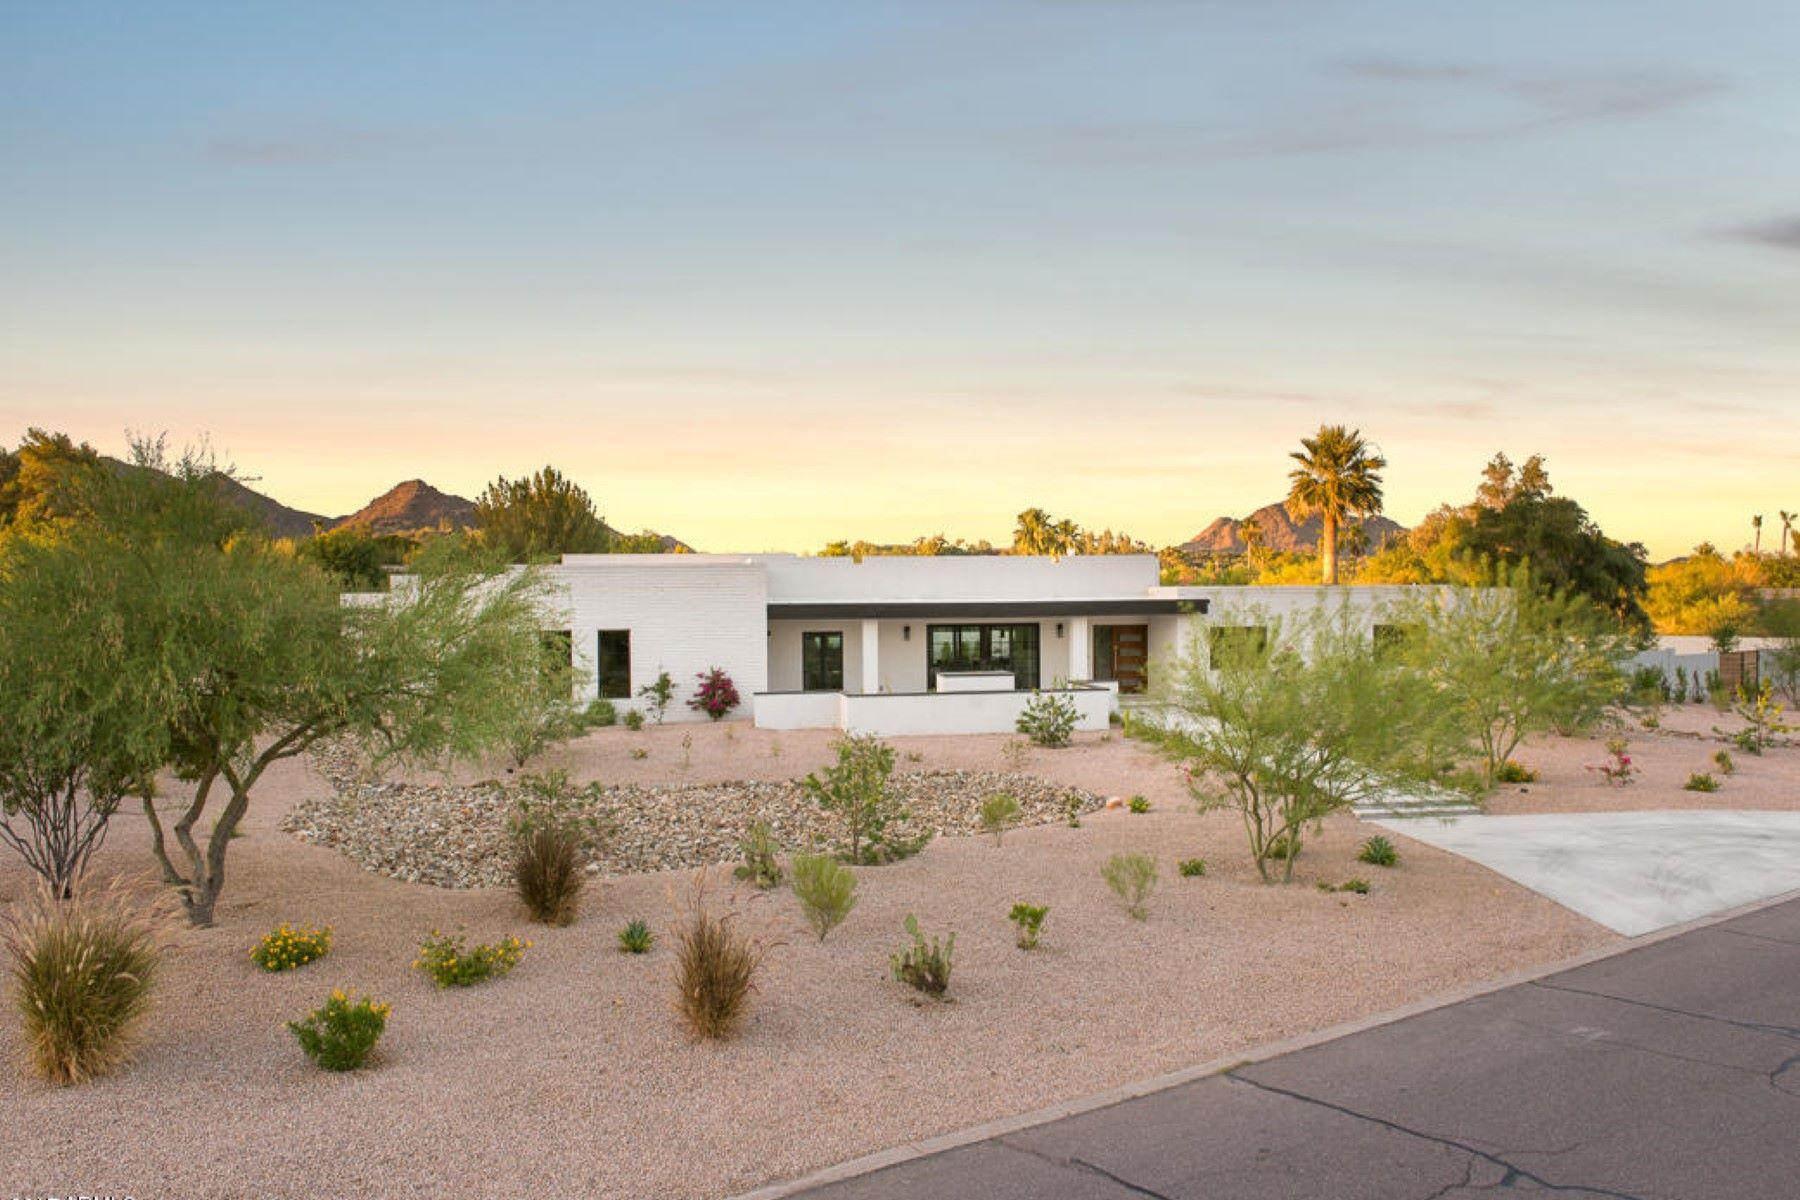 Maison unifamiliale pour l Vente à Beautiful contemporary home with stunning views of Camelback Mountain 3902 E Solano Drive Paradise Valley, Arizona, 85253 États-Unis